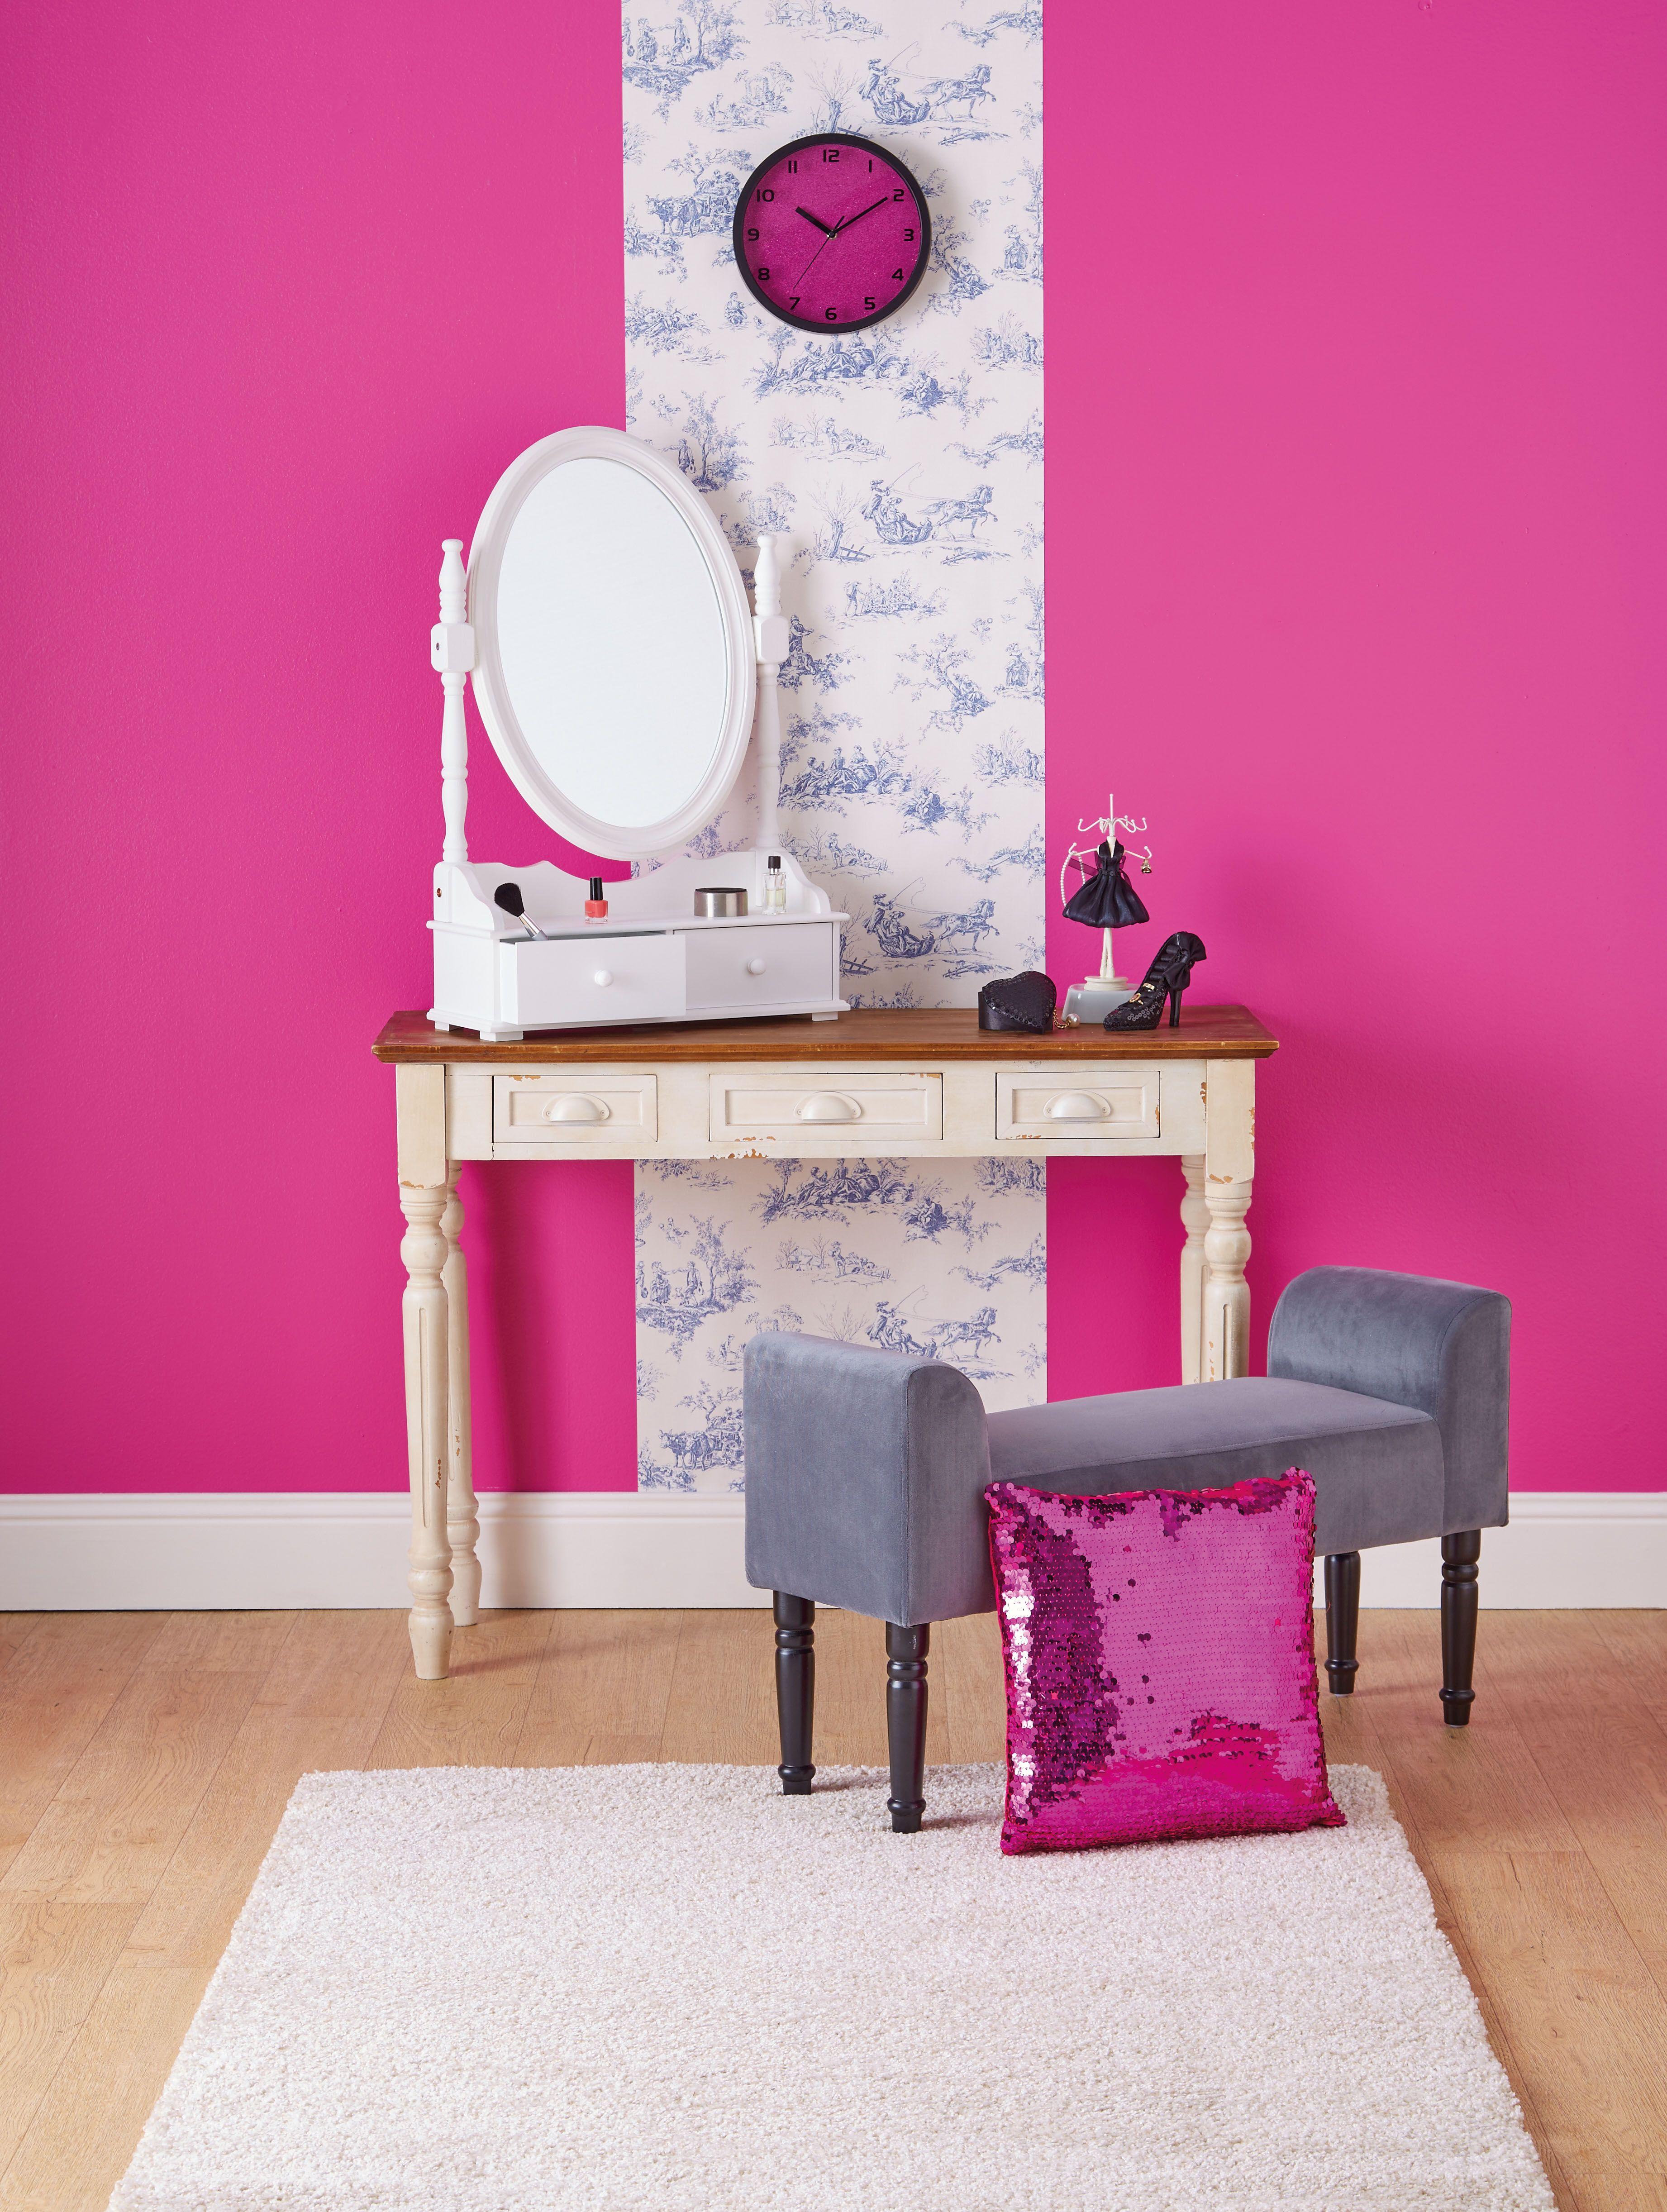 Souvent Coiffeuse, ambiance girly Centrakor | Mes meubles et ma déco  OX58